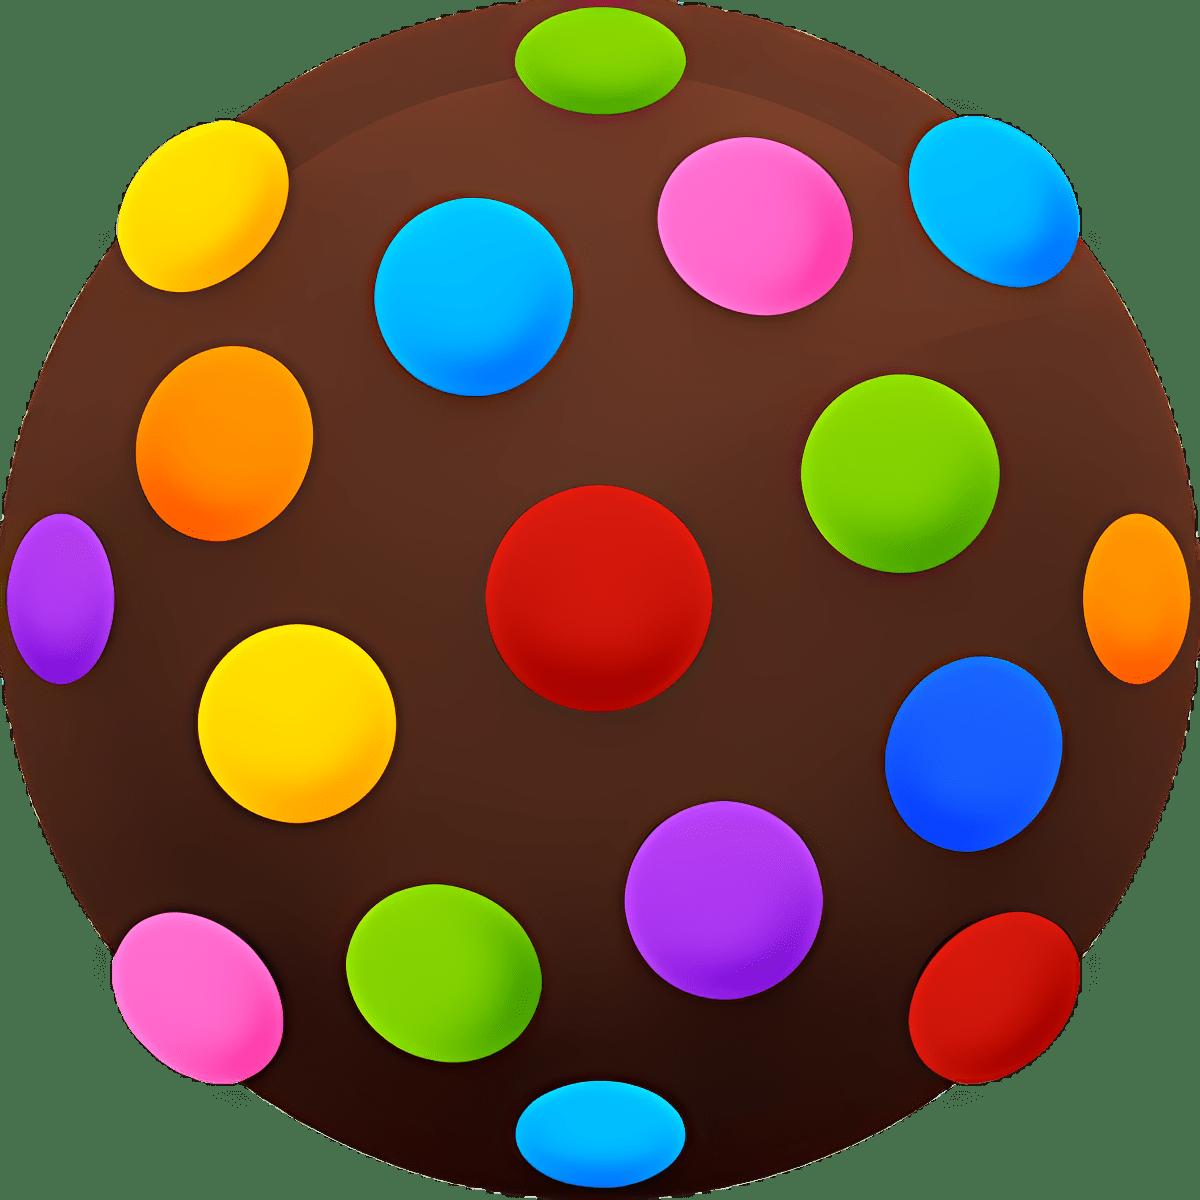 Joyas dulces manía saga